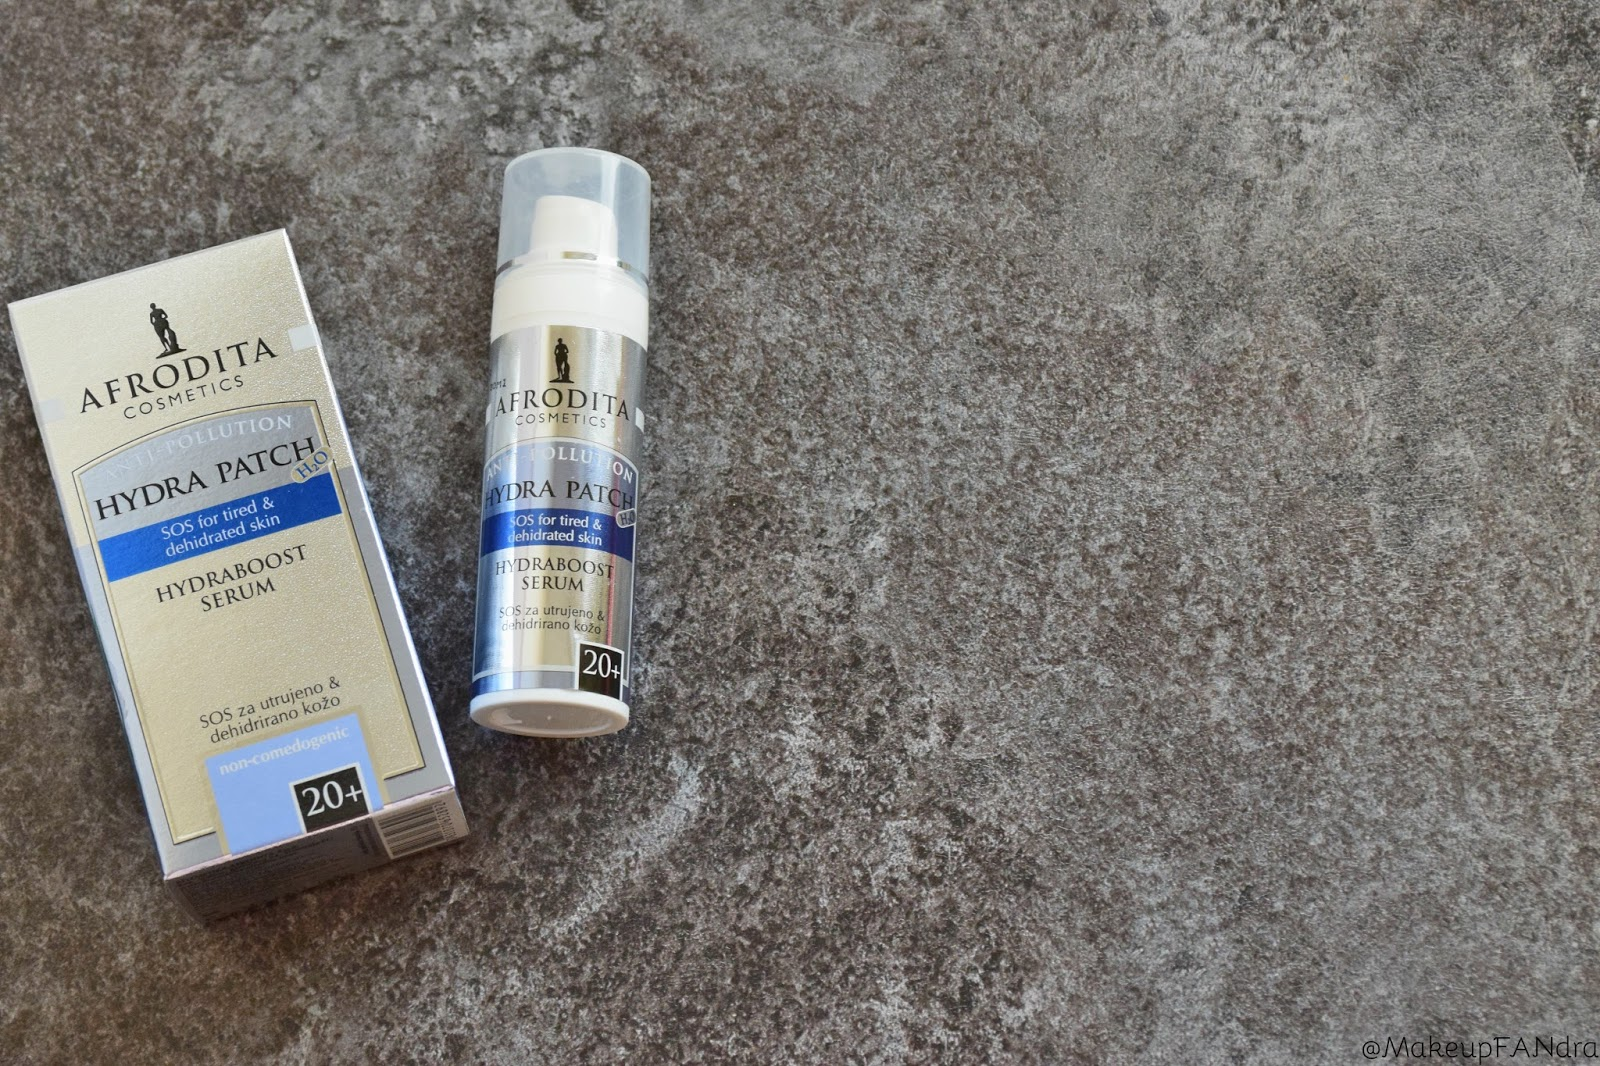 Afrodita-hydra-patch-serum-za-lice